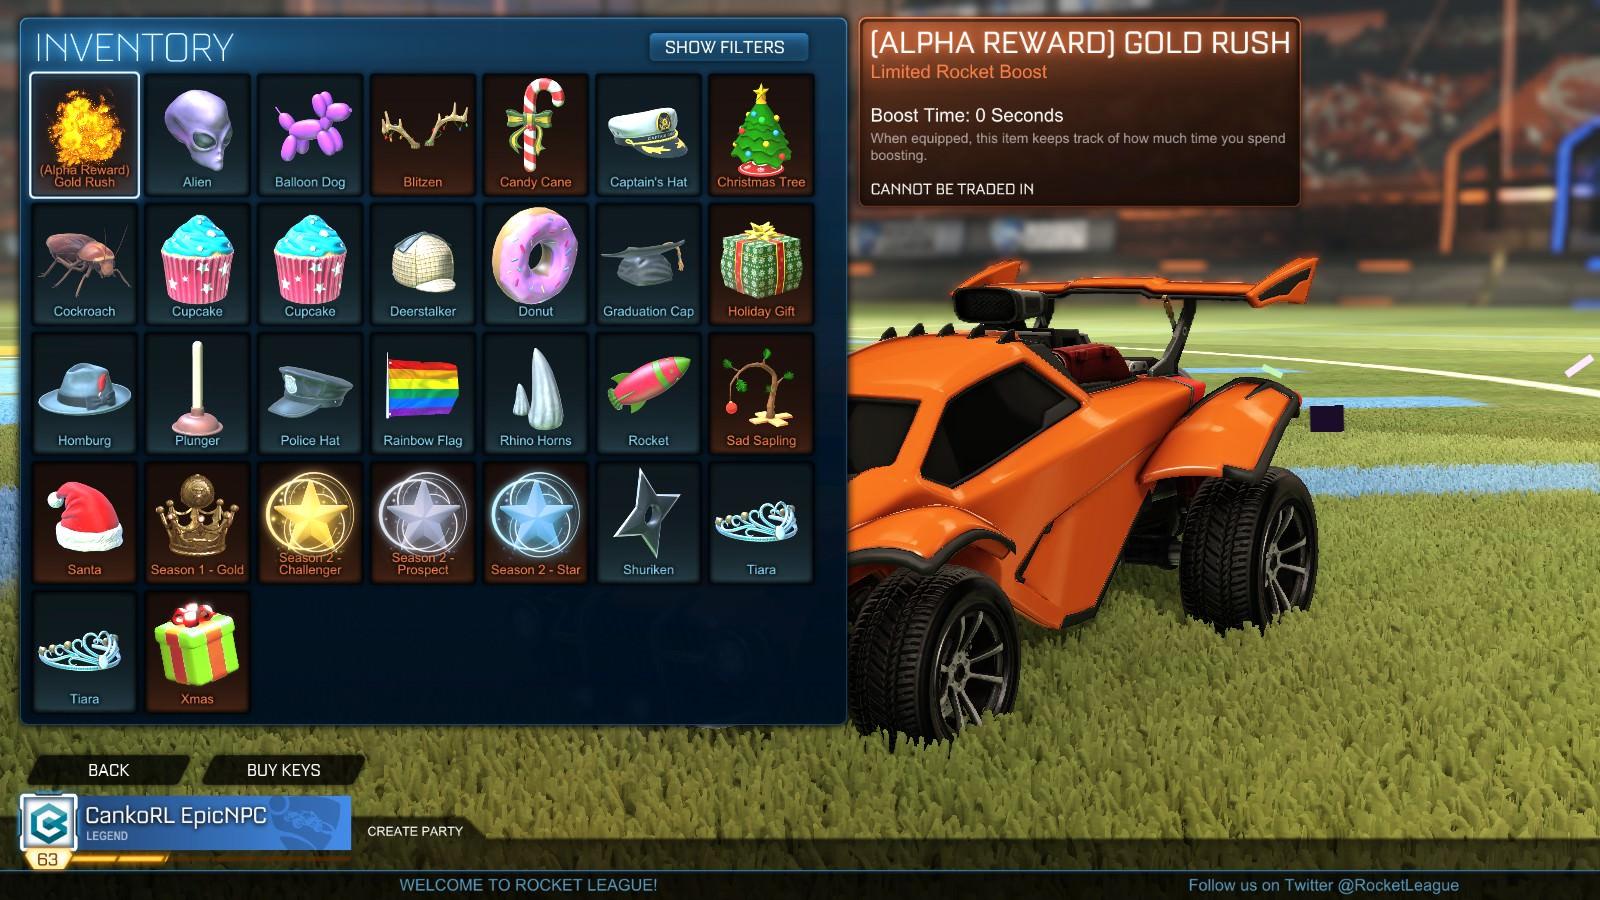 Selling Alpha Boost Gold Rush Rocket League Account Epicnpc Marketplace